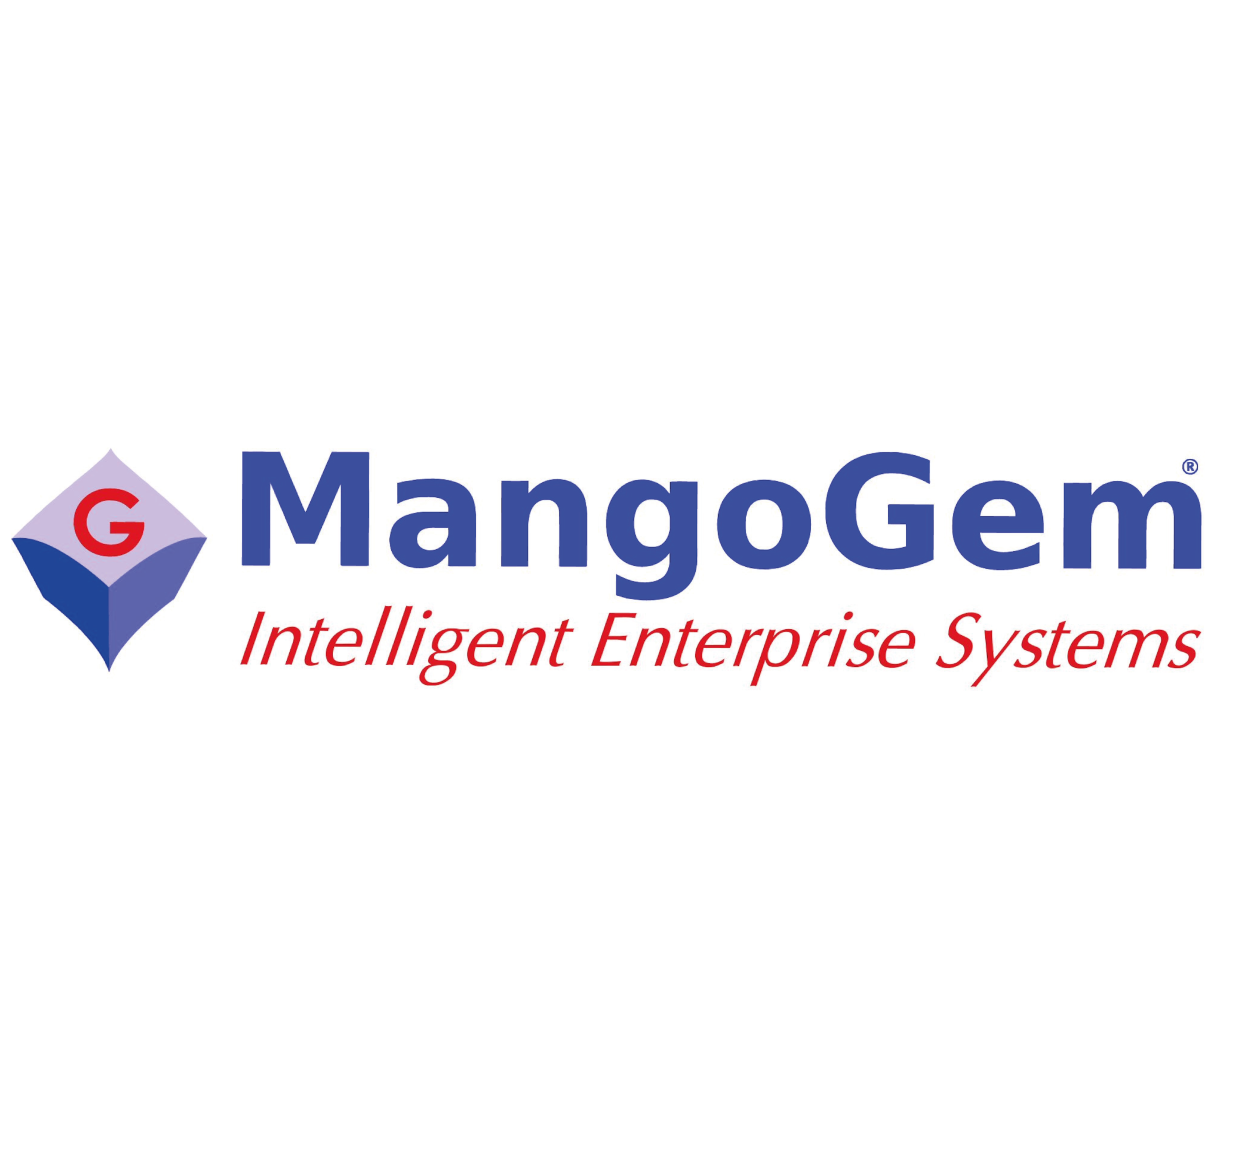 MangoGem